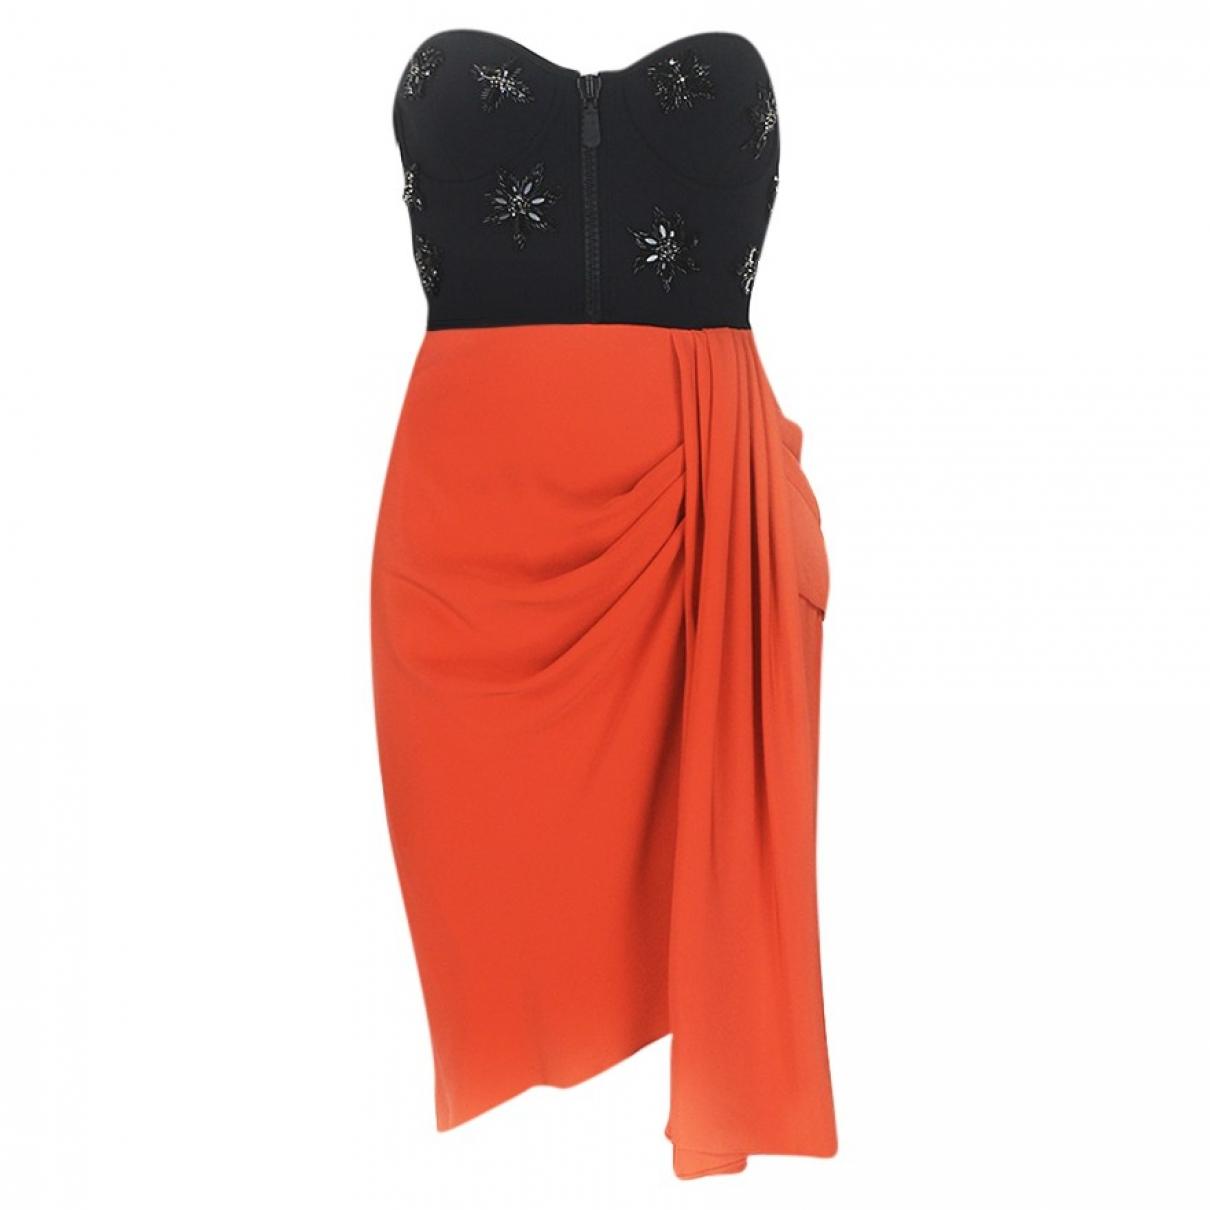 Emilio Pucci \N Kleid in  Orange Synthetik